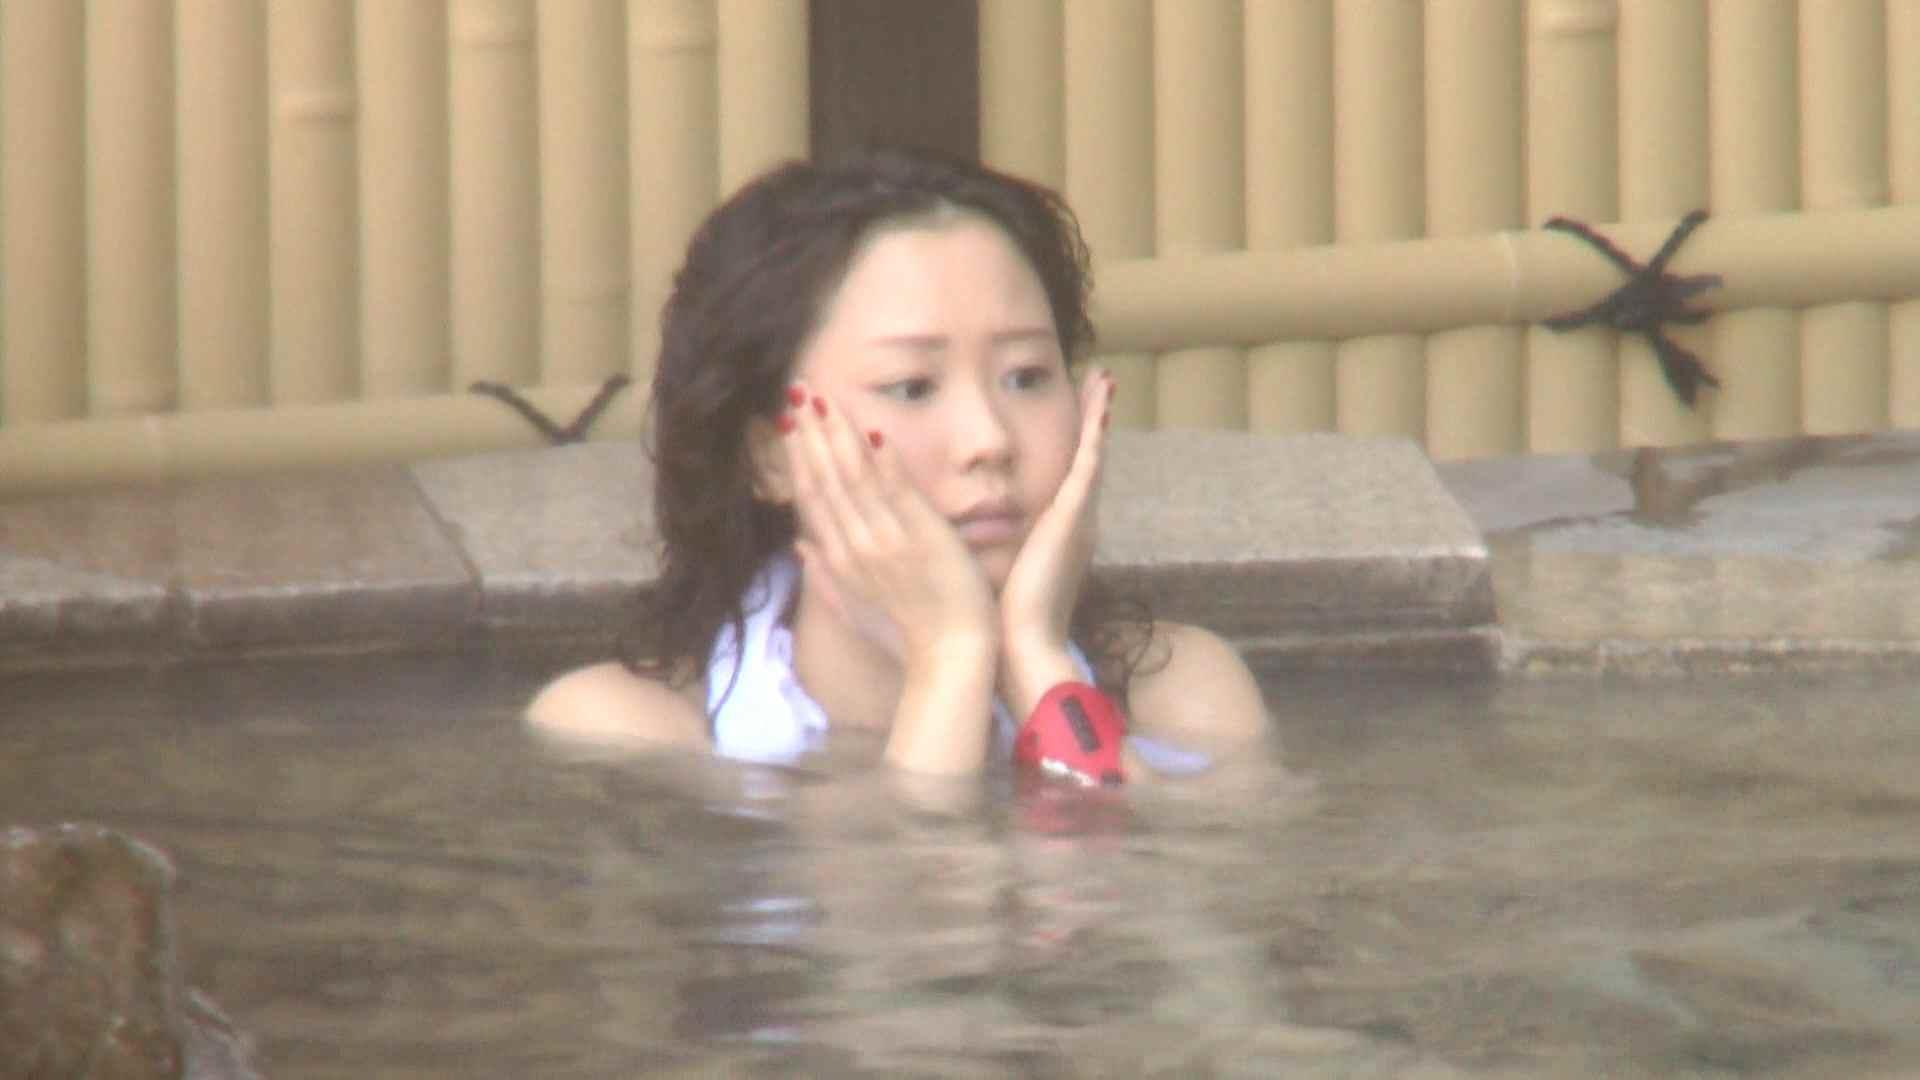 Aquaな露天風呂Vol.211 盗撮シリーズ   露天風呂編  76PIX 11